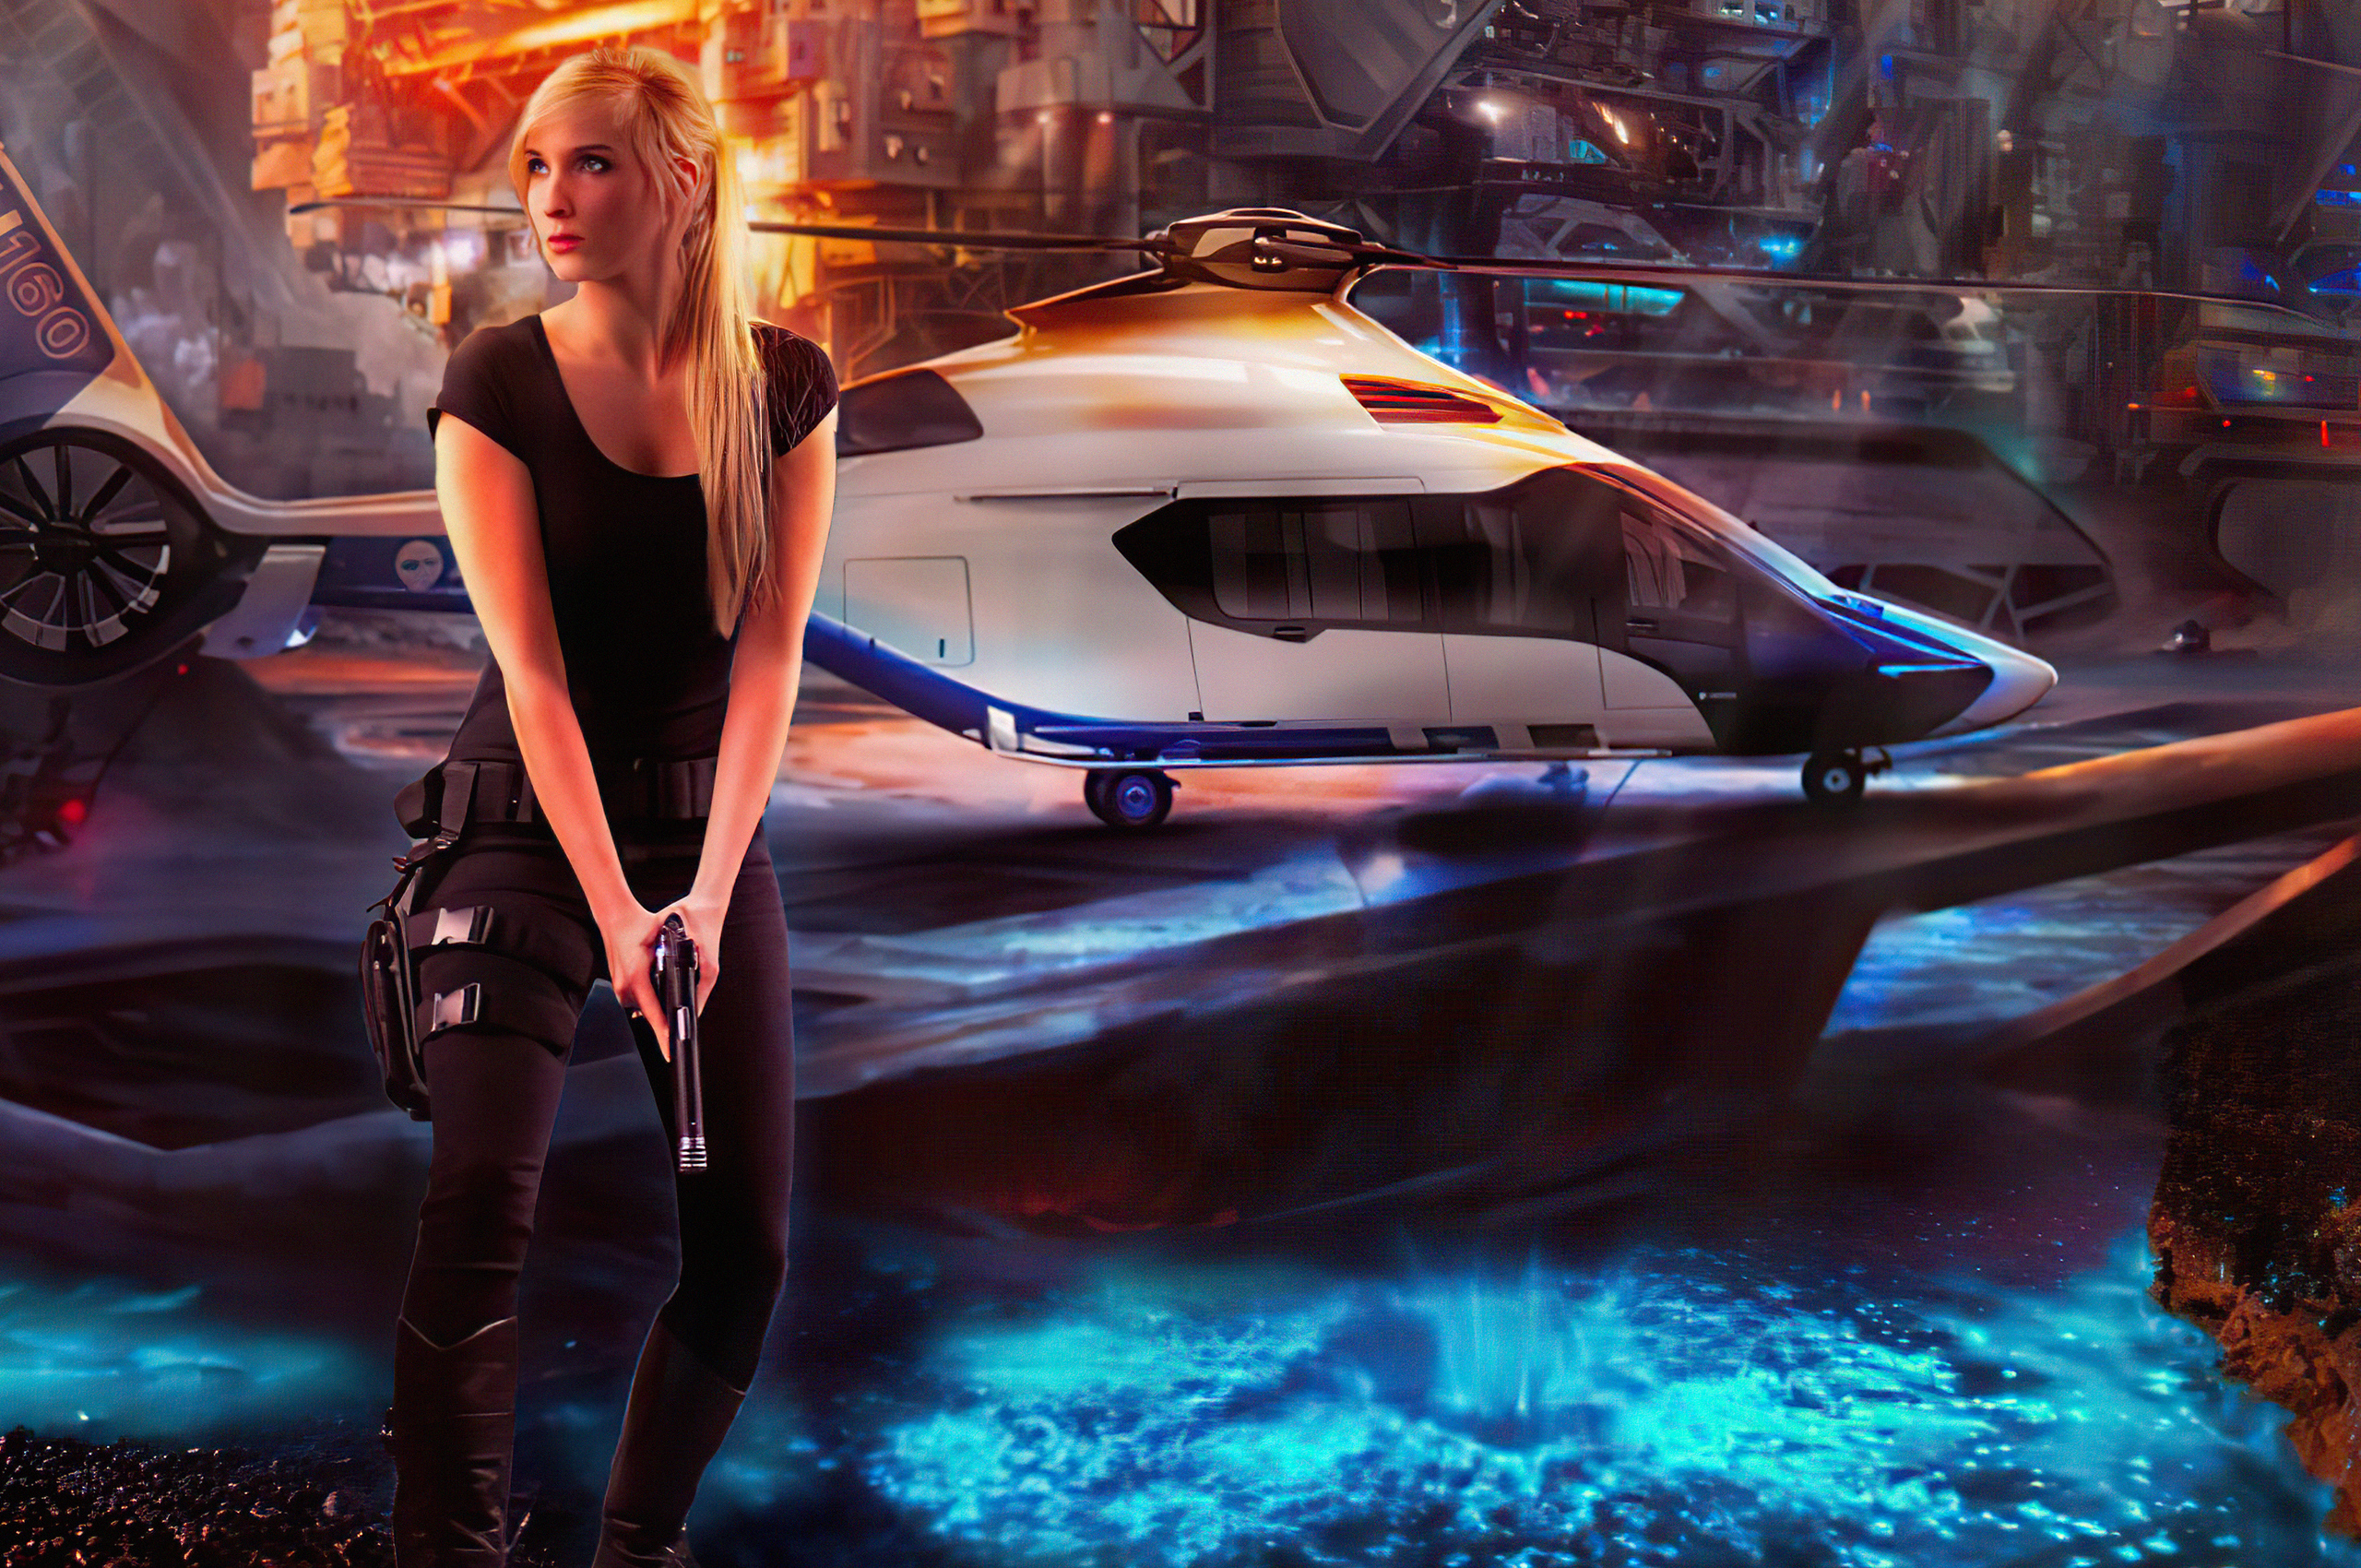 scifi-girl-with-gun-qw.jpg